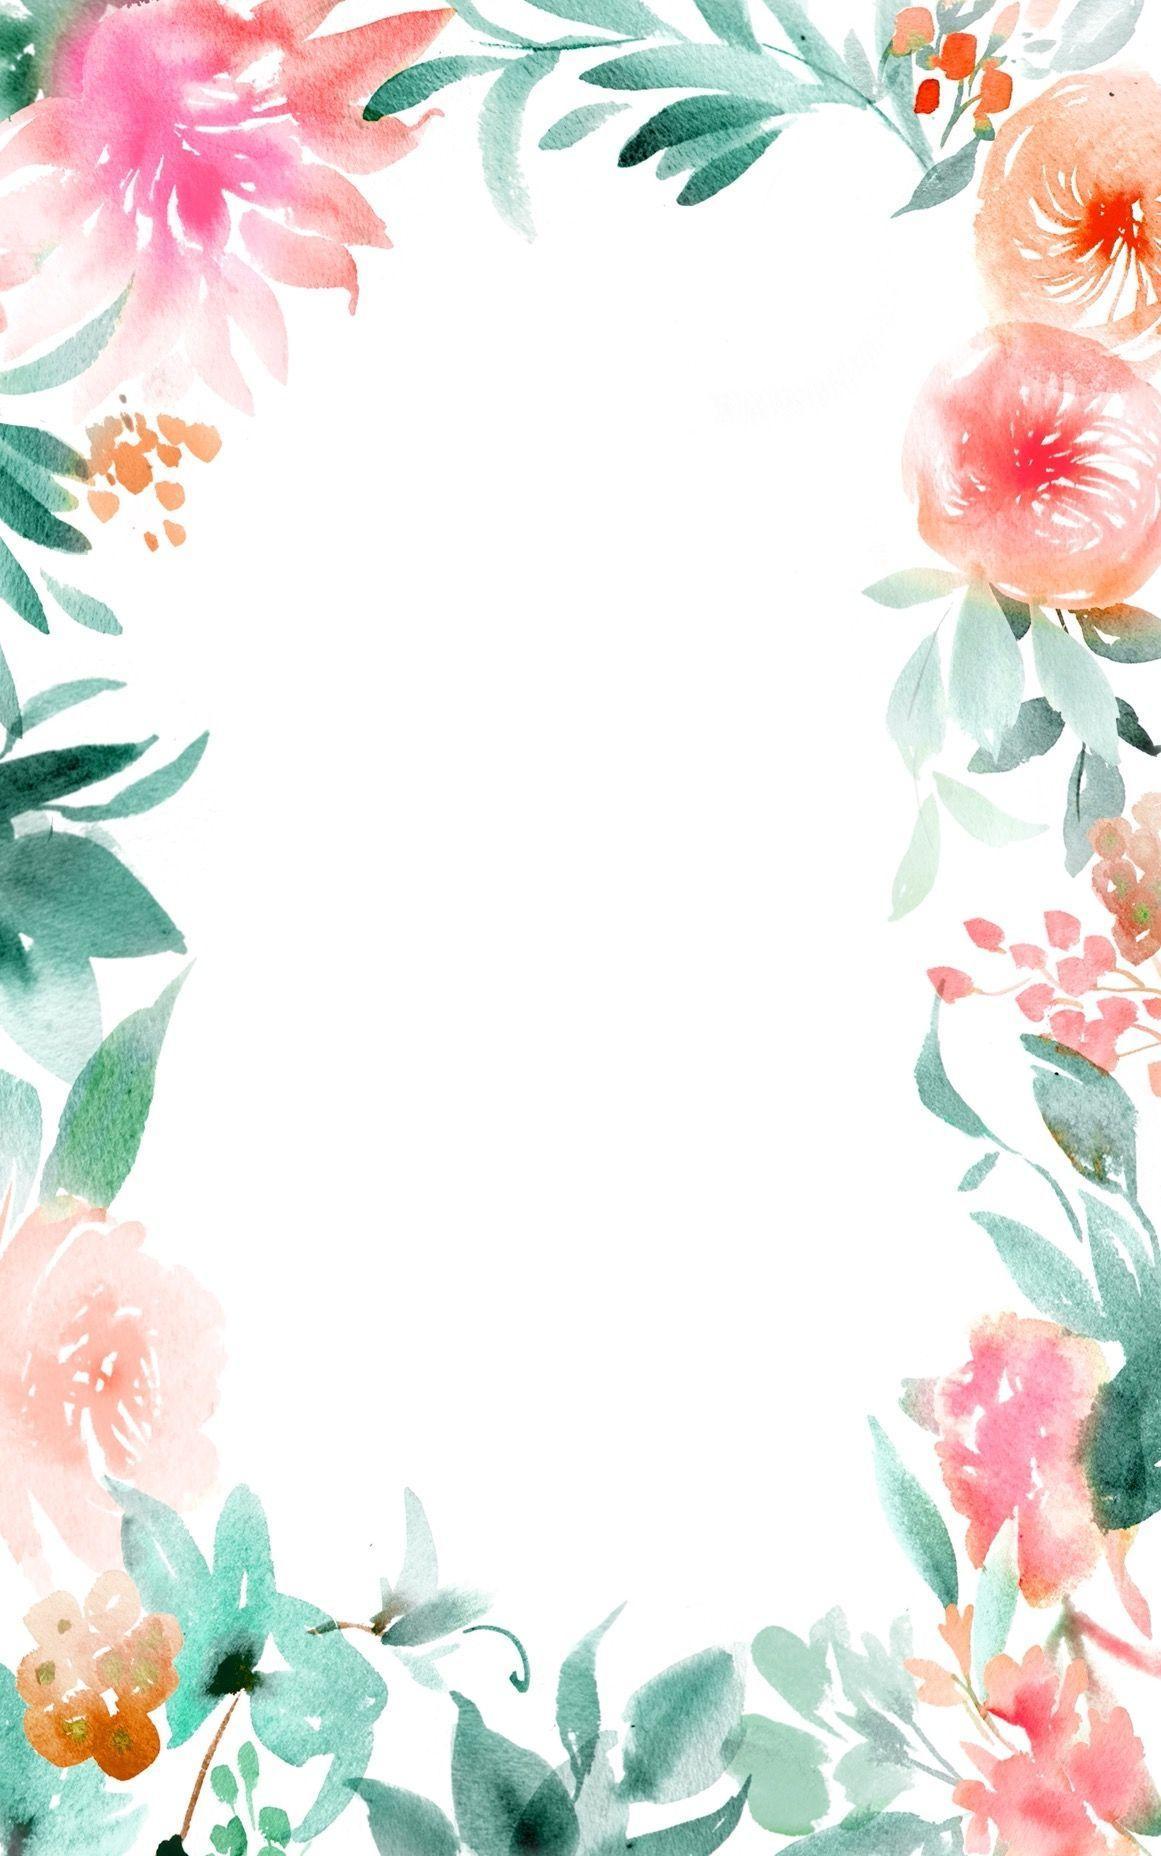 "1060x1884 Vintage Flowers Wallpaper Hd Iphone | Wallpapergenk"">"